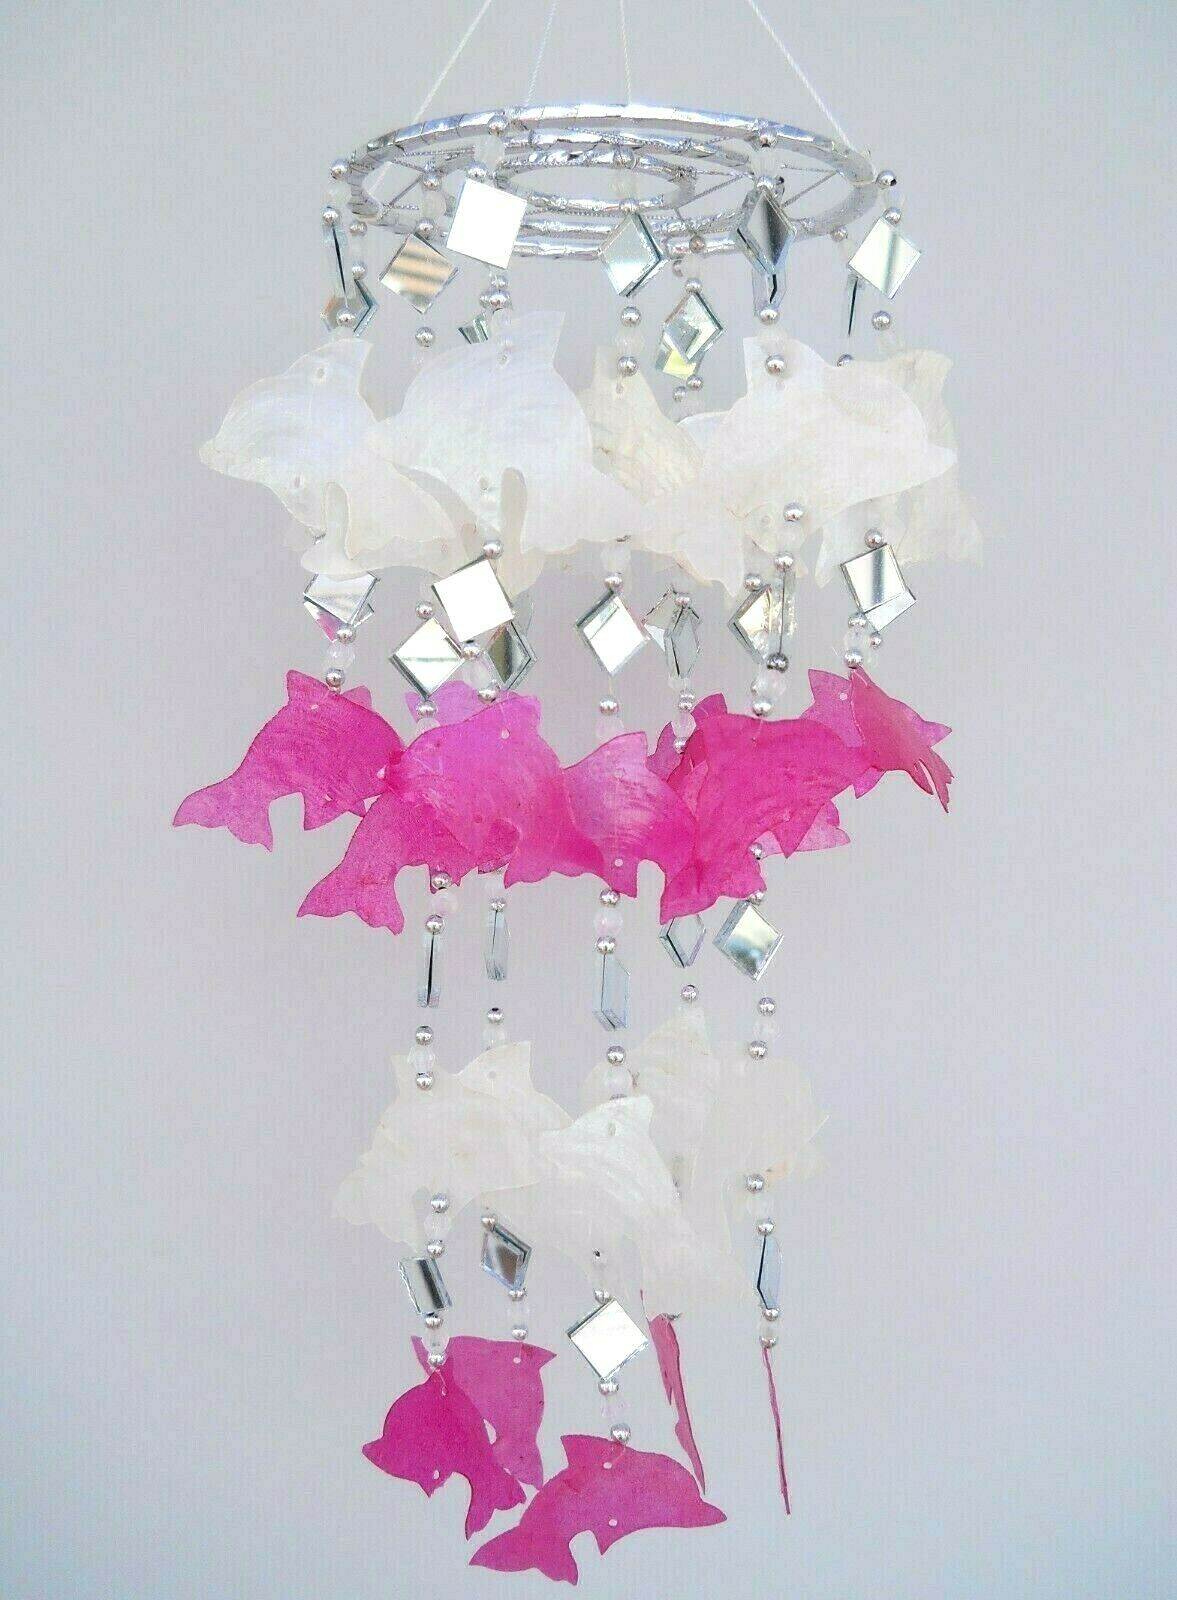 Capiz Shells Shape Jellyfish Windchime Mobile Pink & White Dolphins 45 cm